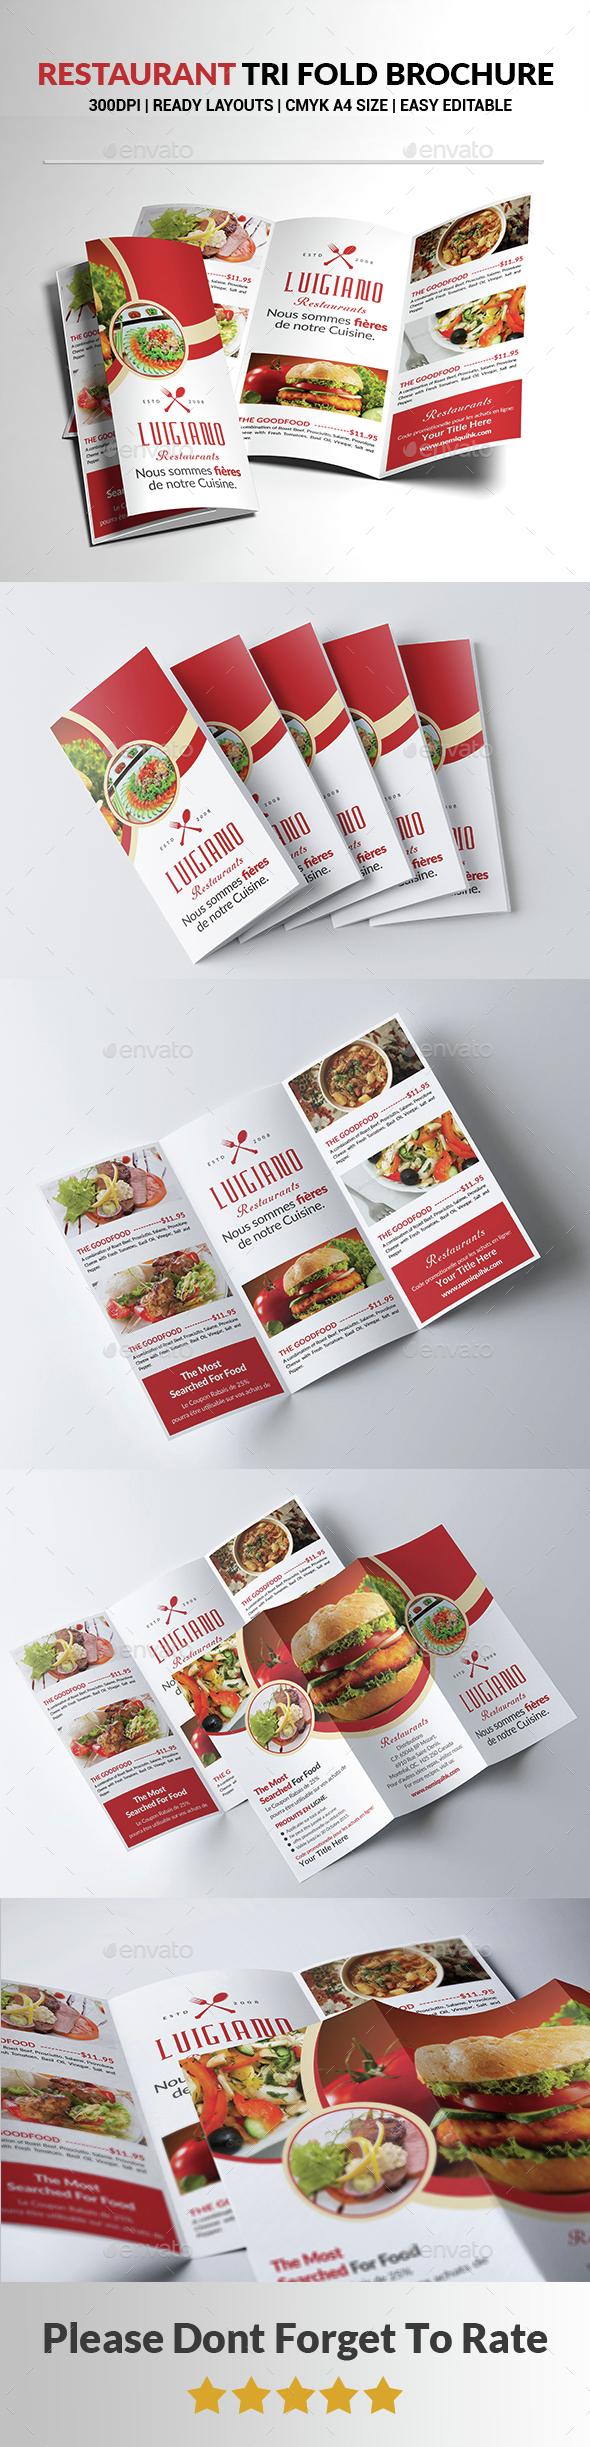 Restaurant Tri Fold Brochure  - Brochures Print Templates